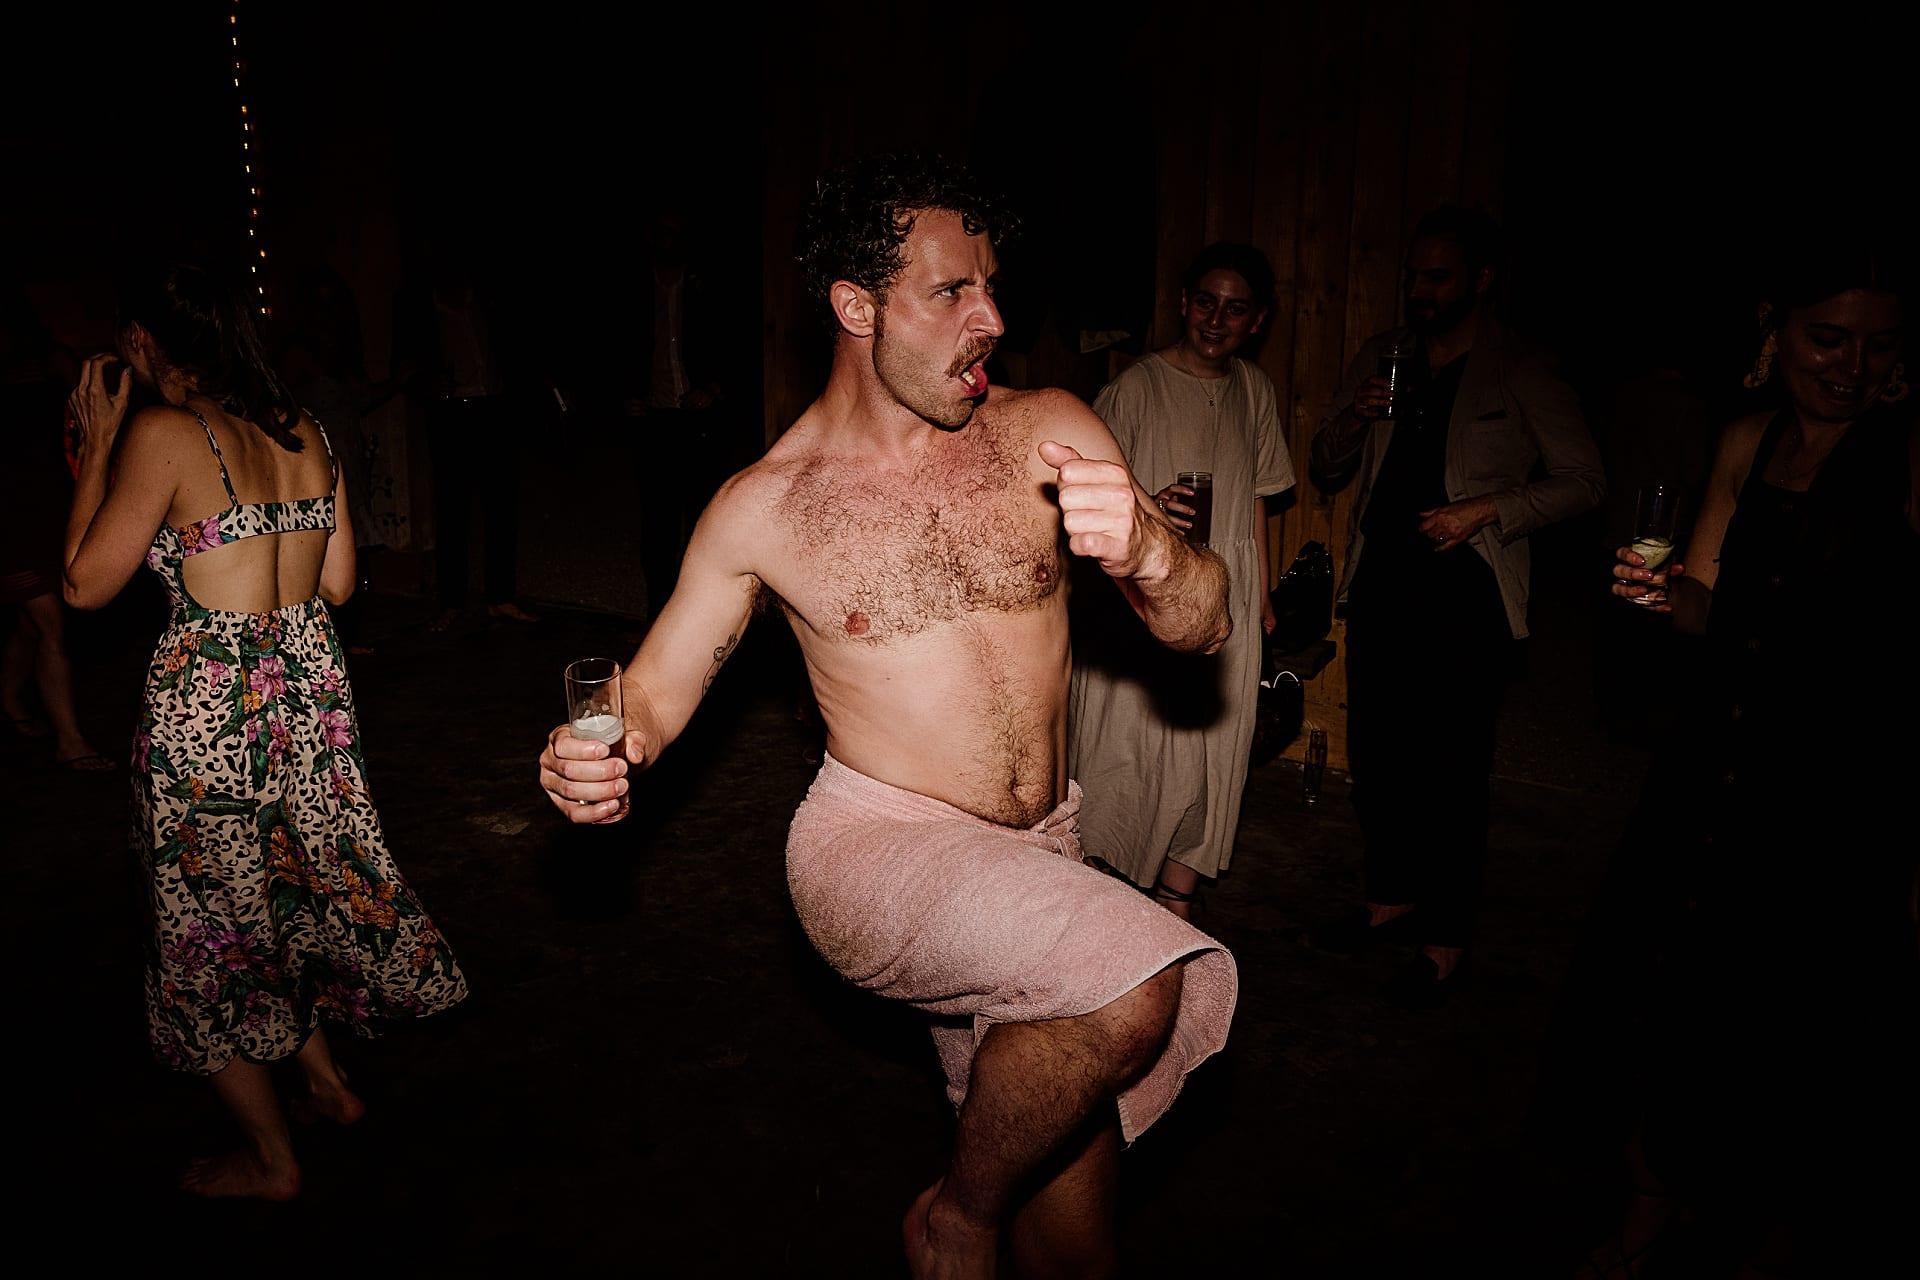 Dancing man in a towel